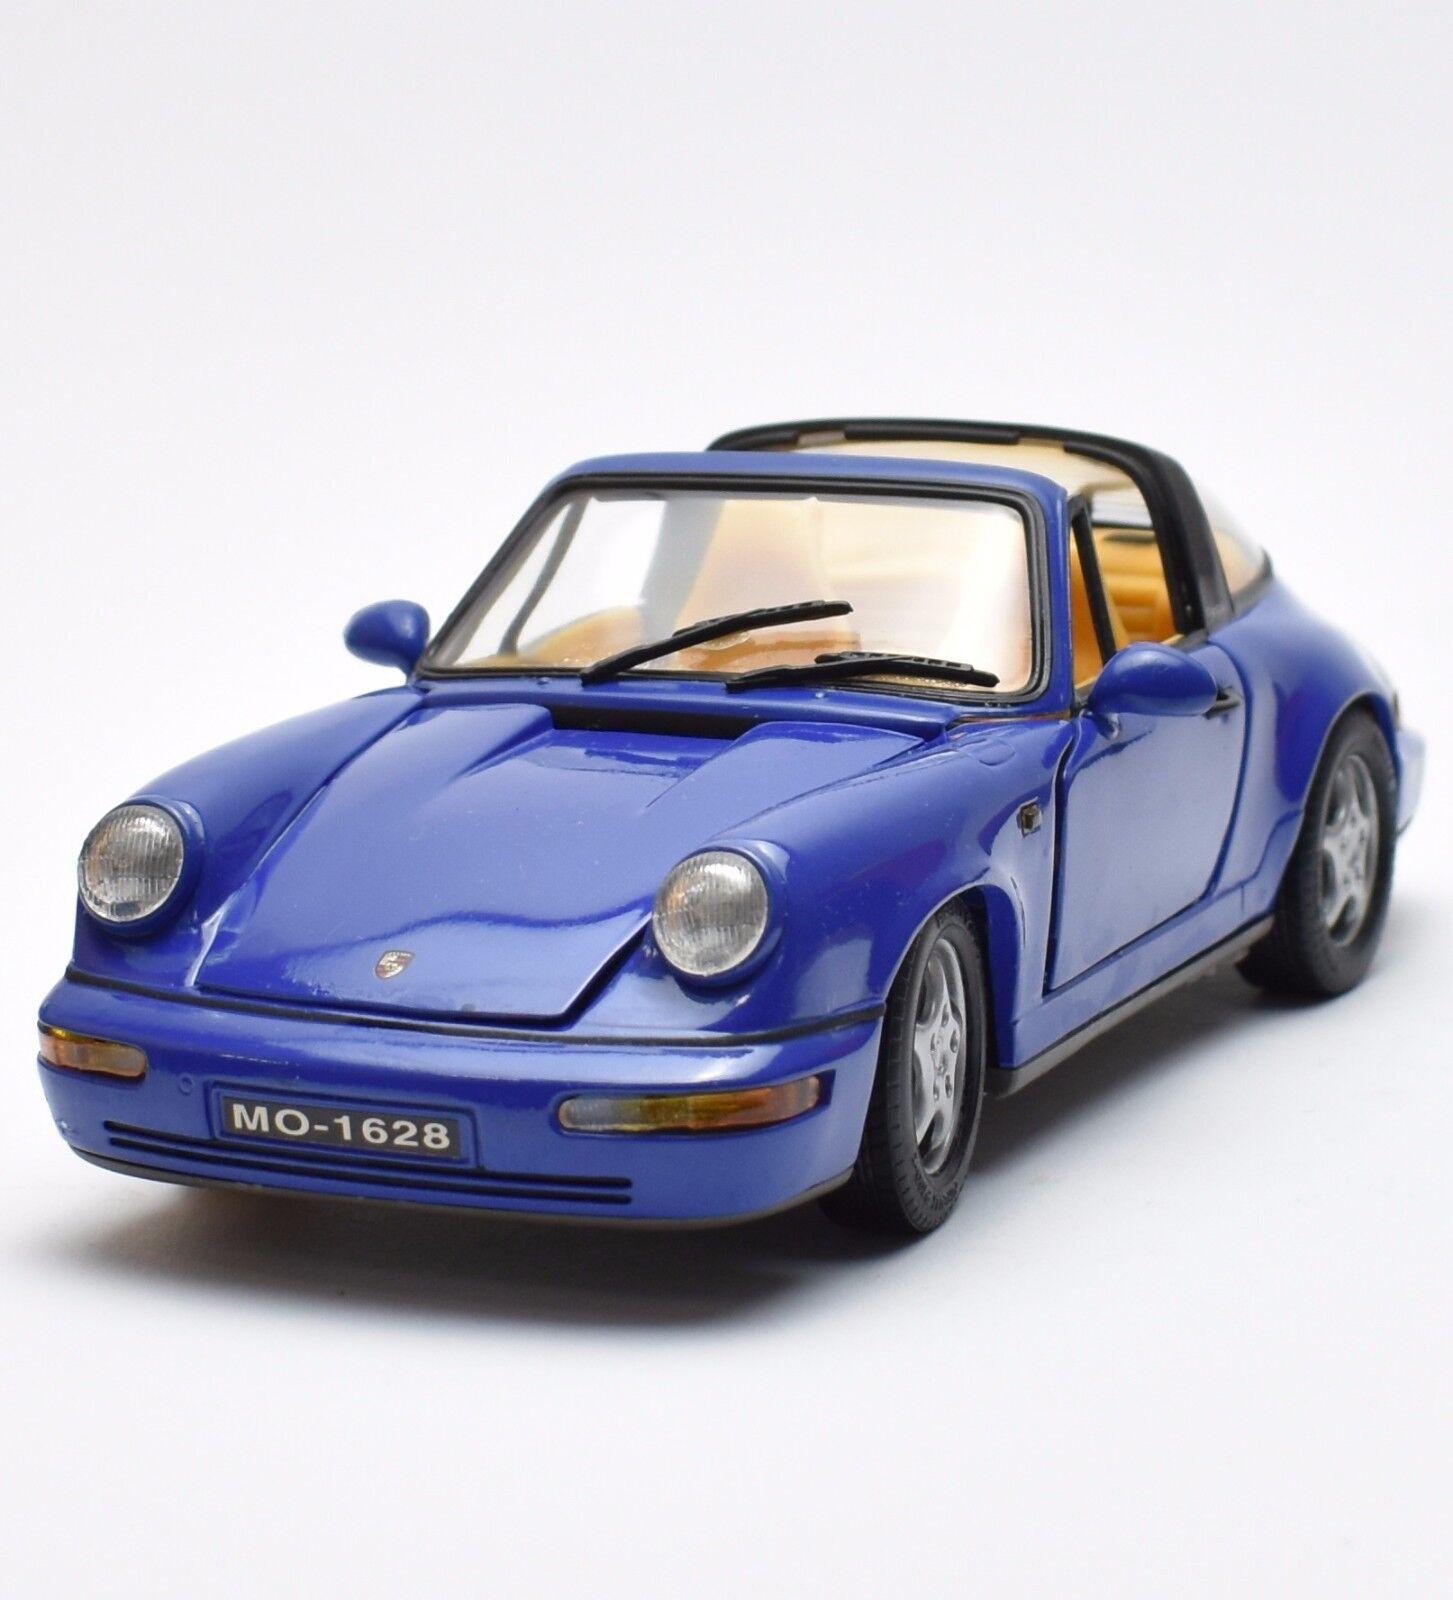 Anson Klassiker Porsche 911 Carrera 2 targa Sportwagen in blau, 1 18, OVP, K019  | Günstig